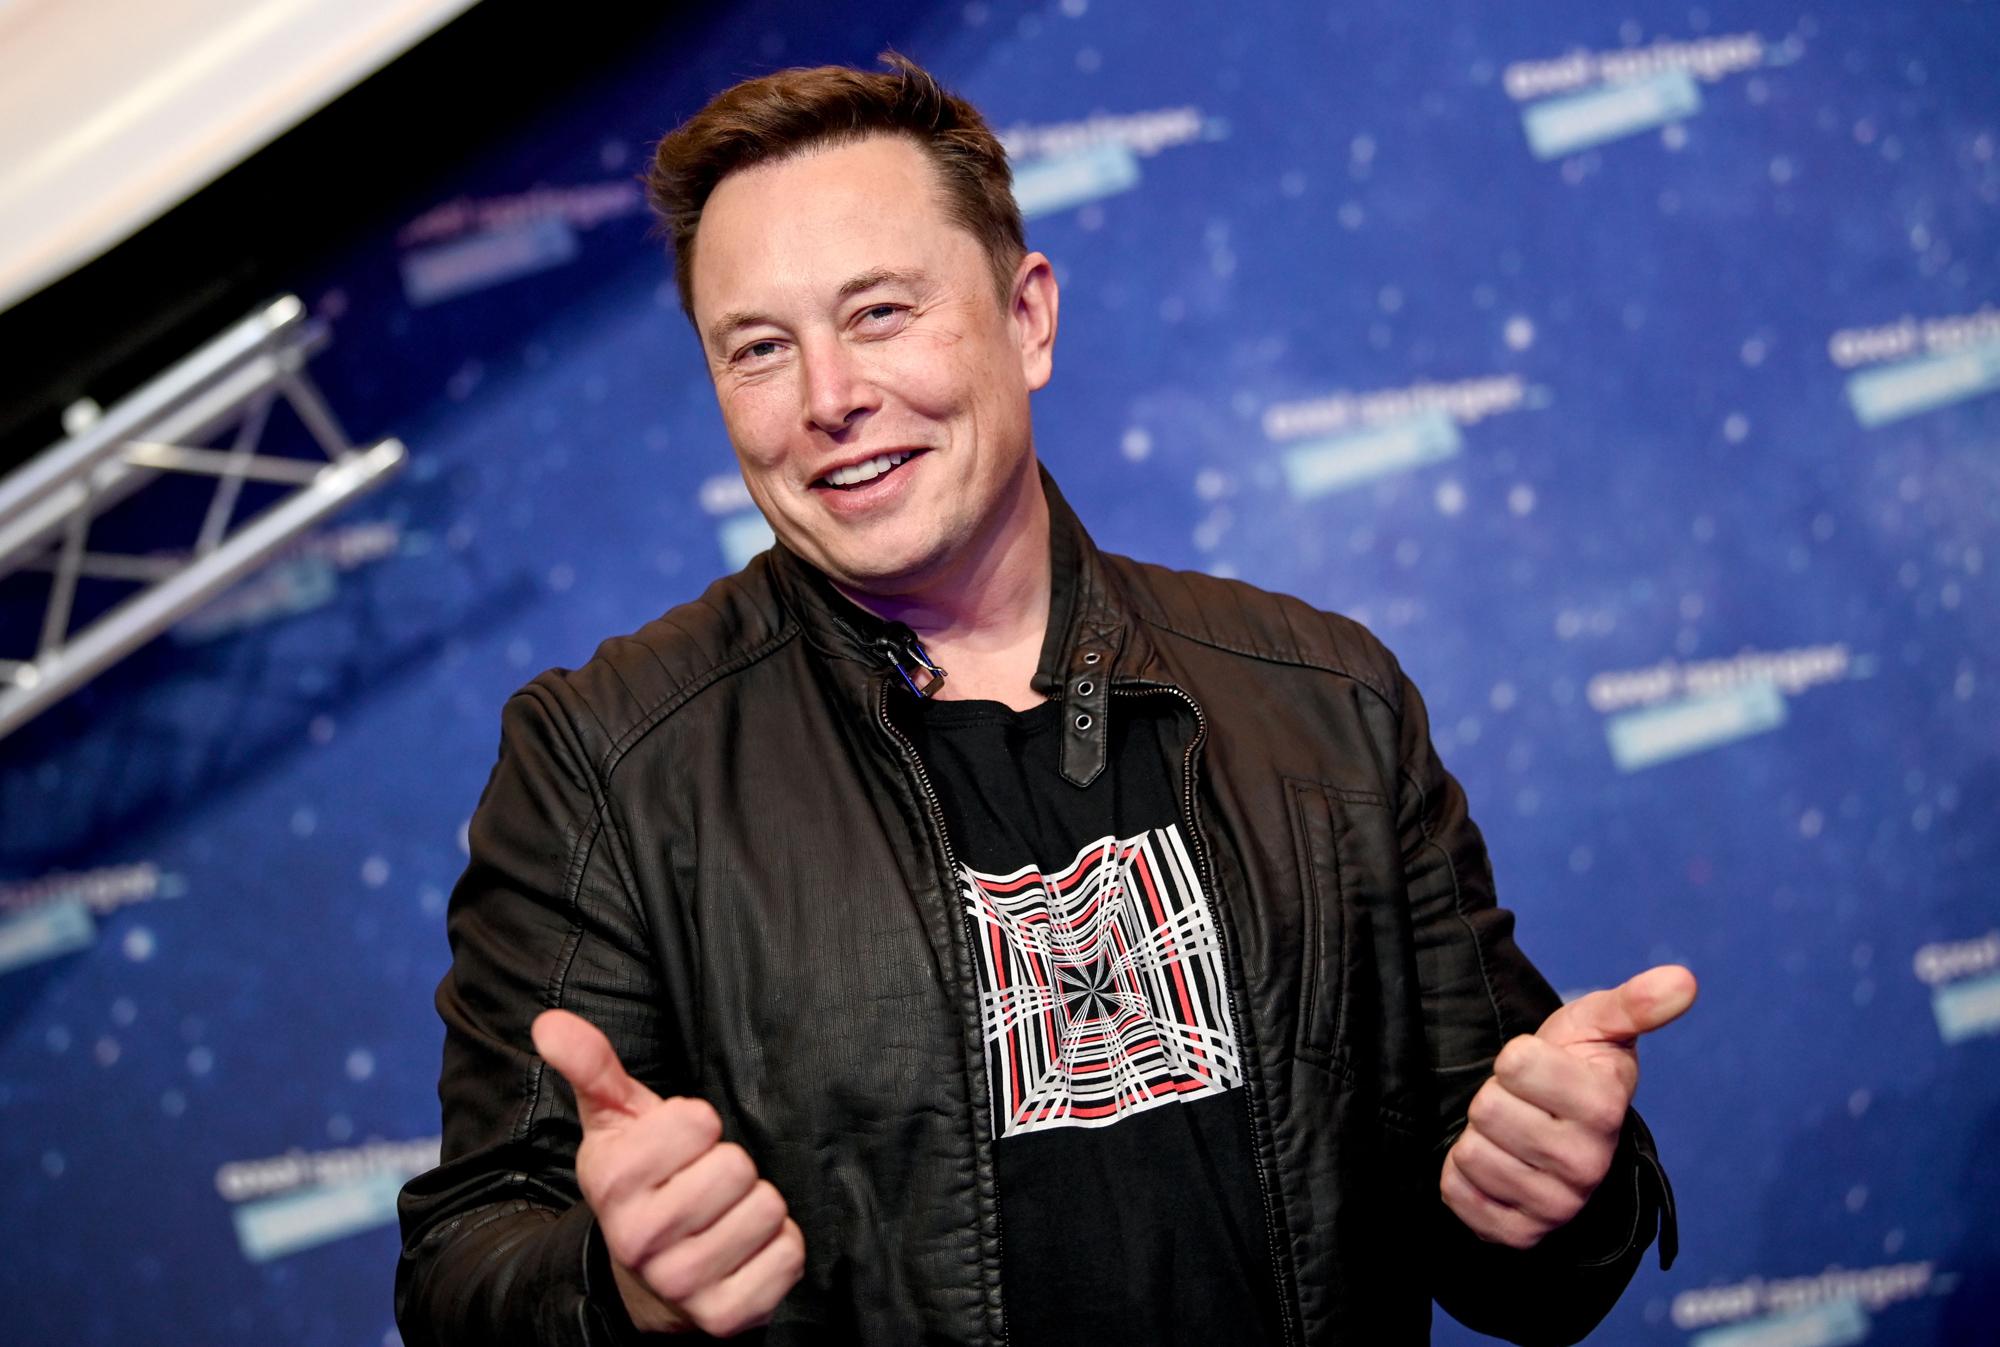 Elon Musk's grandfather, Joshua Haldeman, was a Technocracy leader in Saskatchewan between 1936 and 1941. Musk says he wants to build a 'Martian Technocracy.' (Britta Pedersen/Pool/AFP via Getty Images)